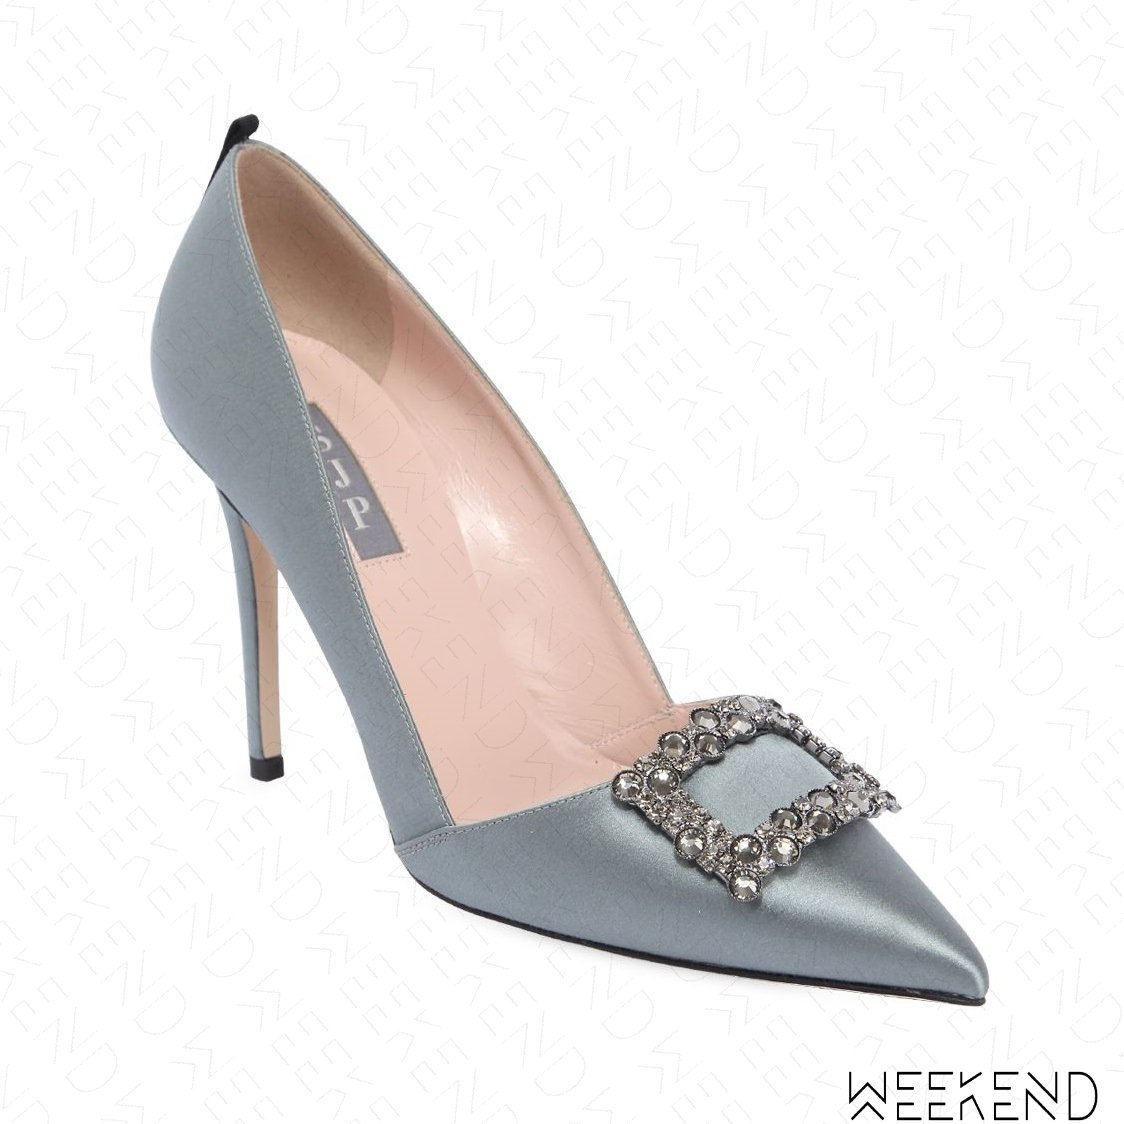 【WEEKEND】 Sarah Jessica Parker SJP Windsor 緞面 鑲鑽 高跟鞋 灰色